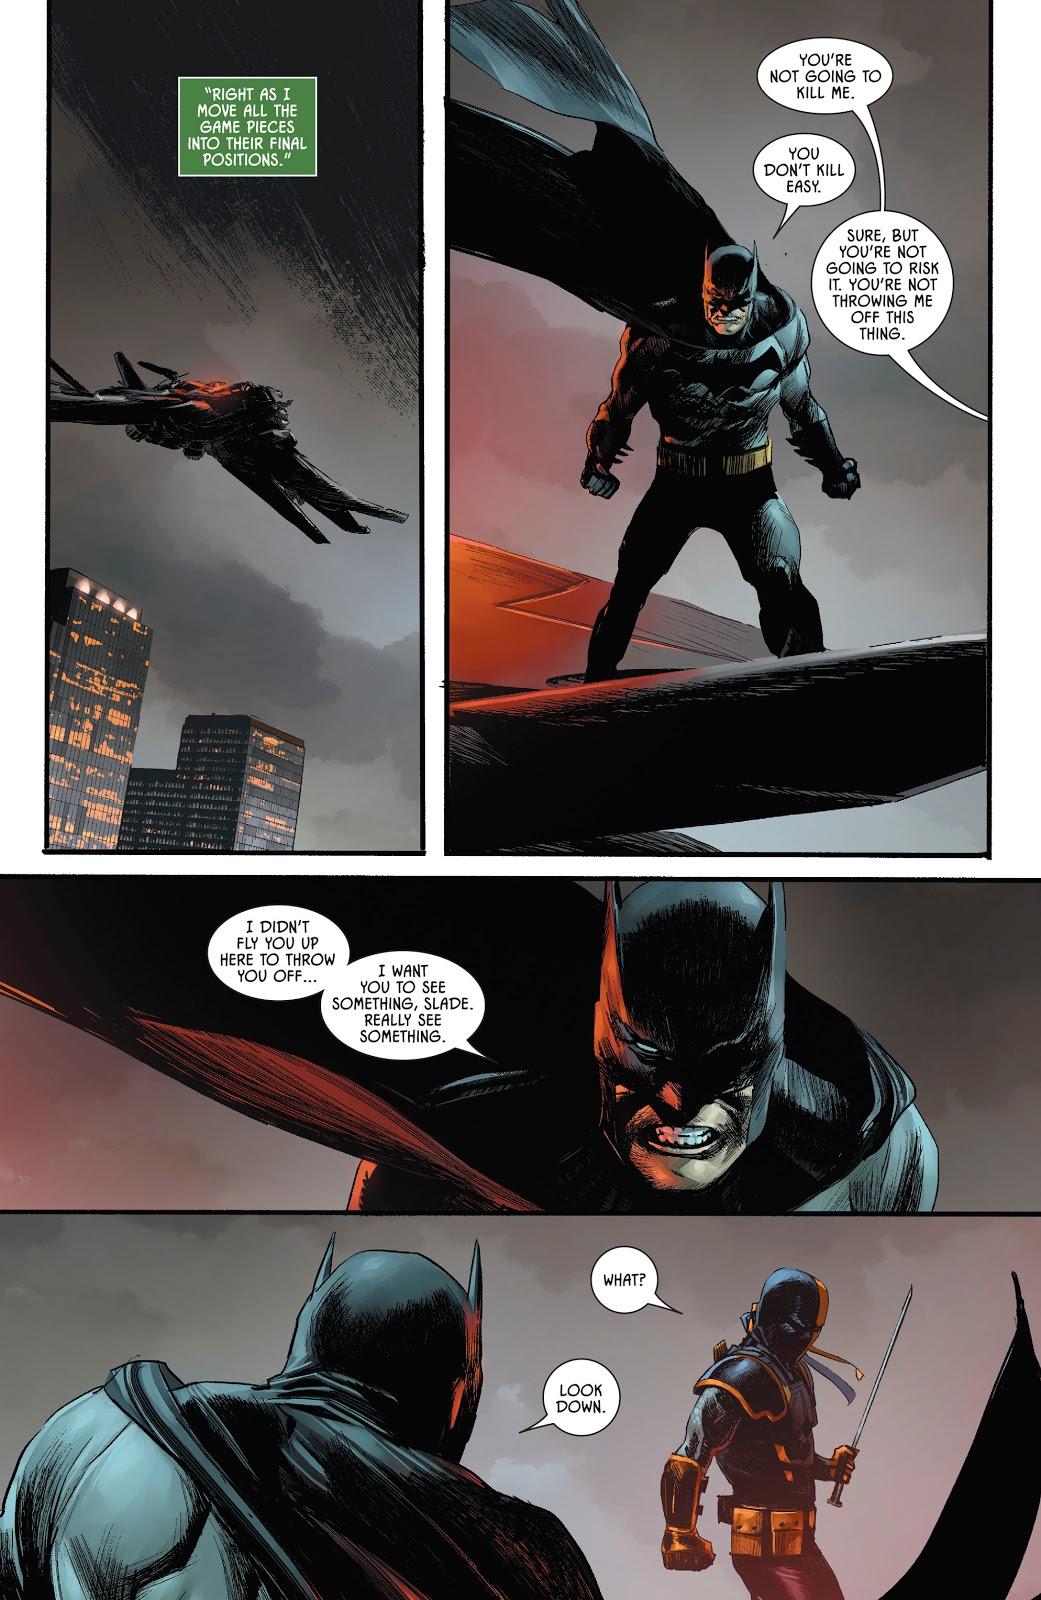 Deathstroke Knows Batman Is Bruce Wayne